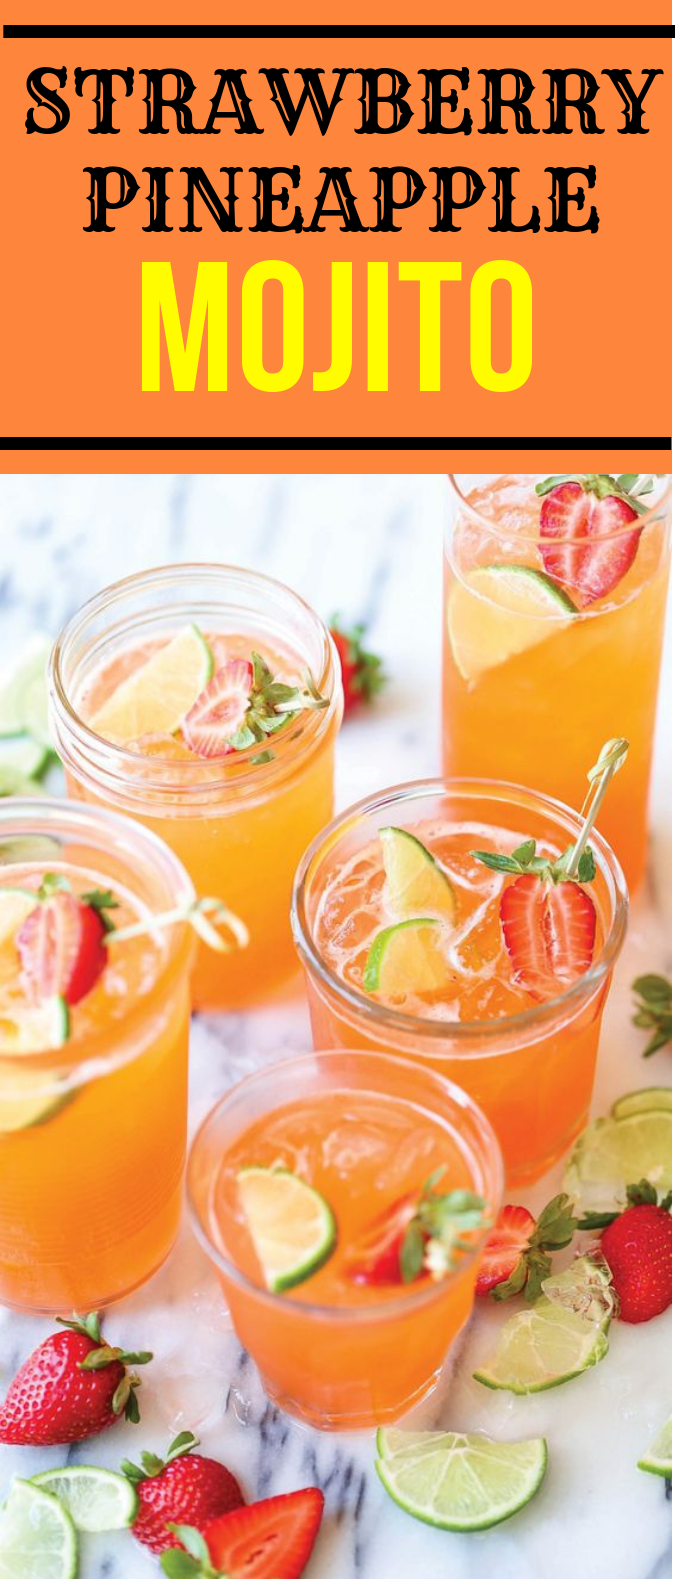 STRAWBERRY PINEAPPLE MOJITO #Drink #SummerDrink